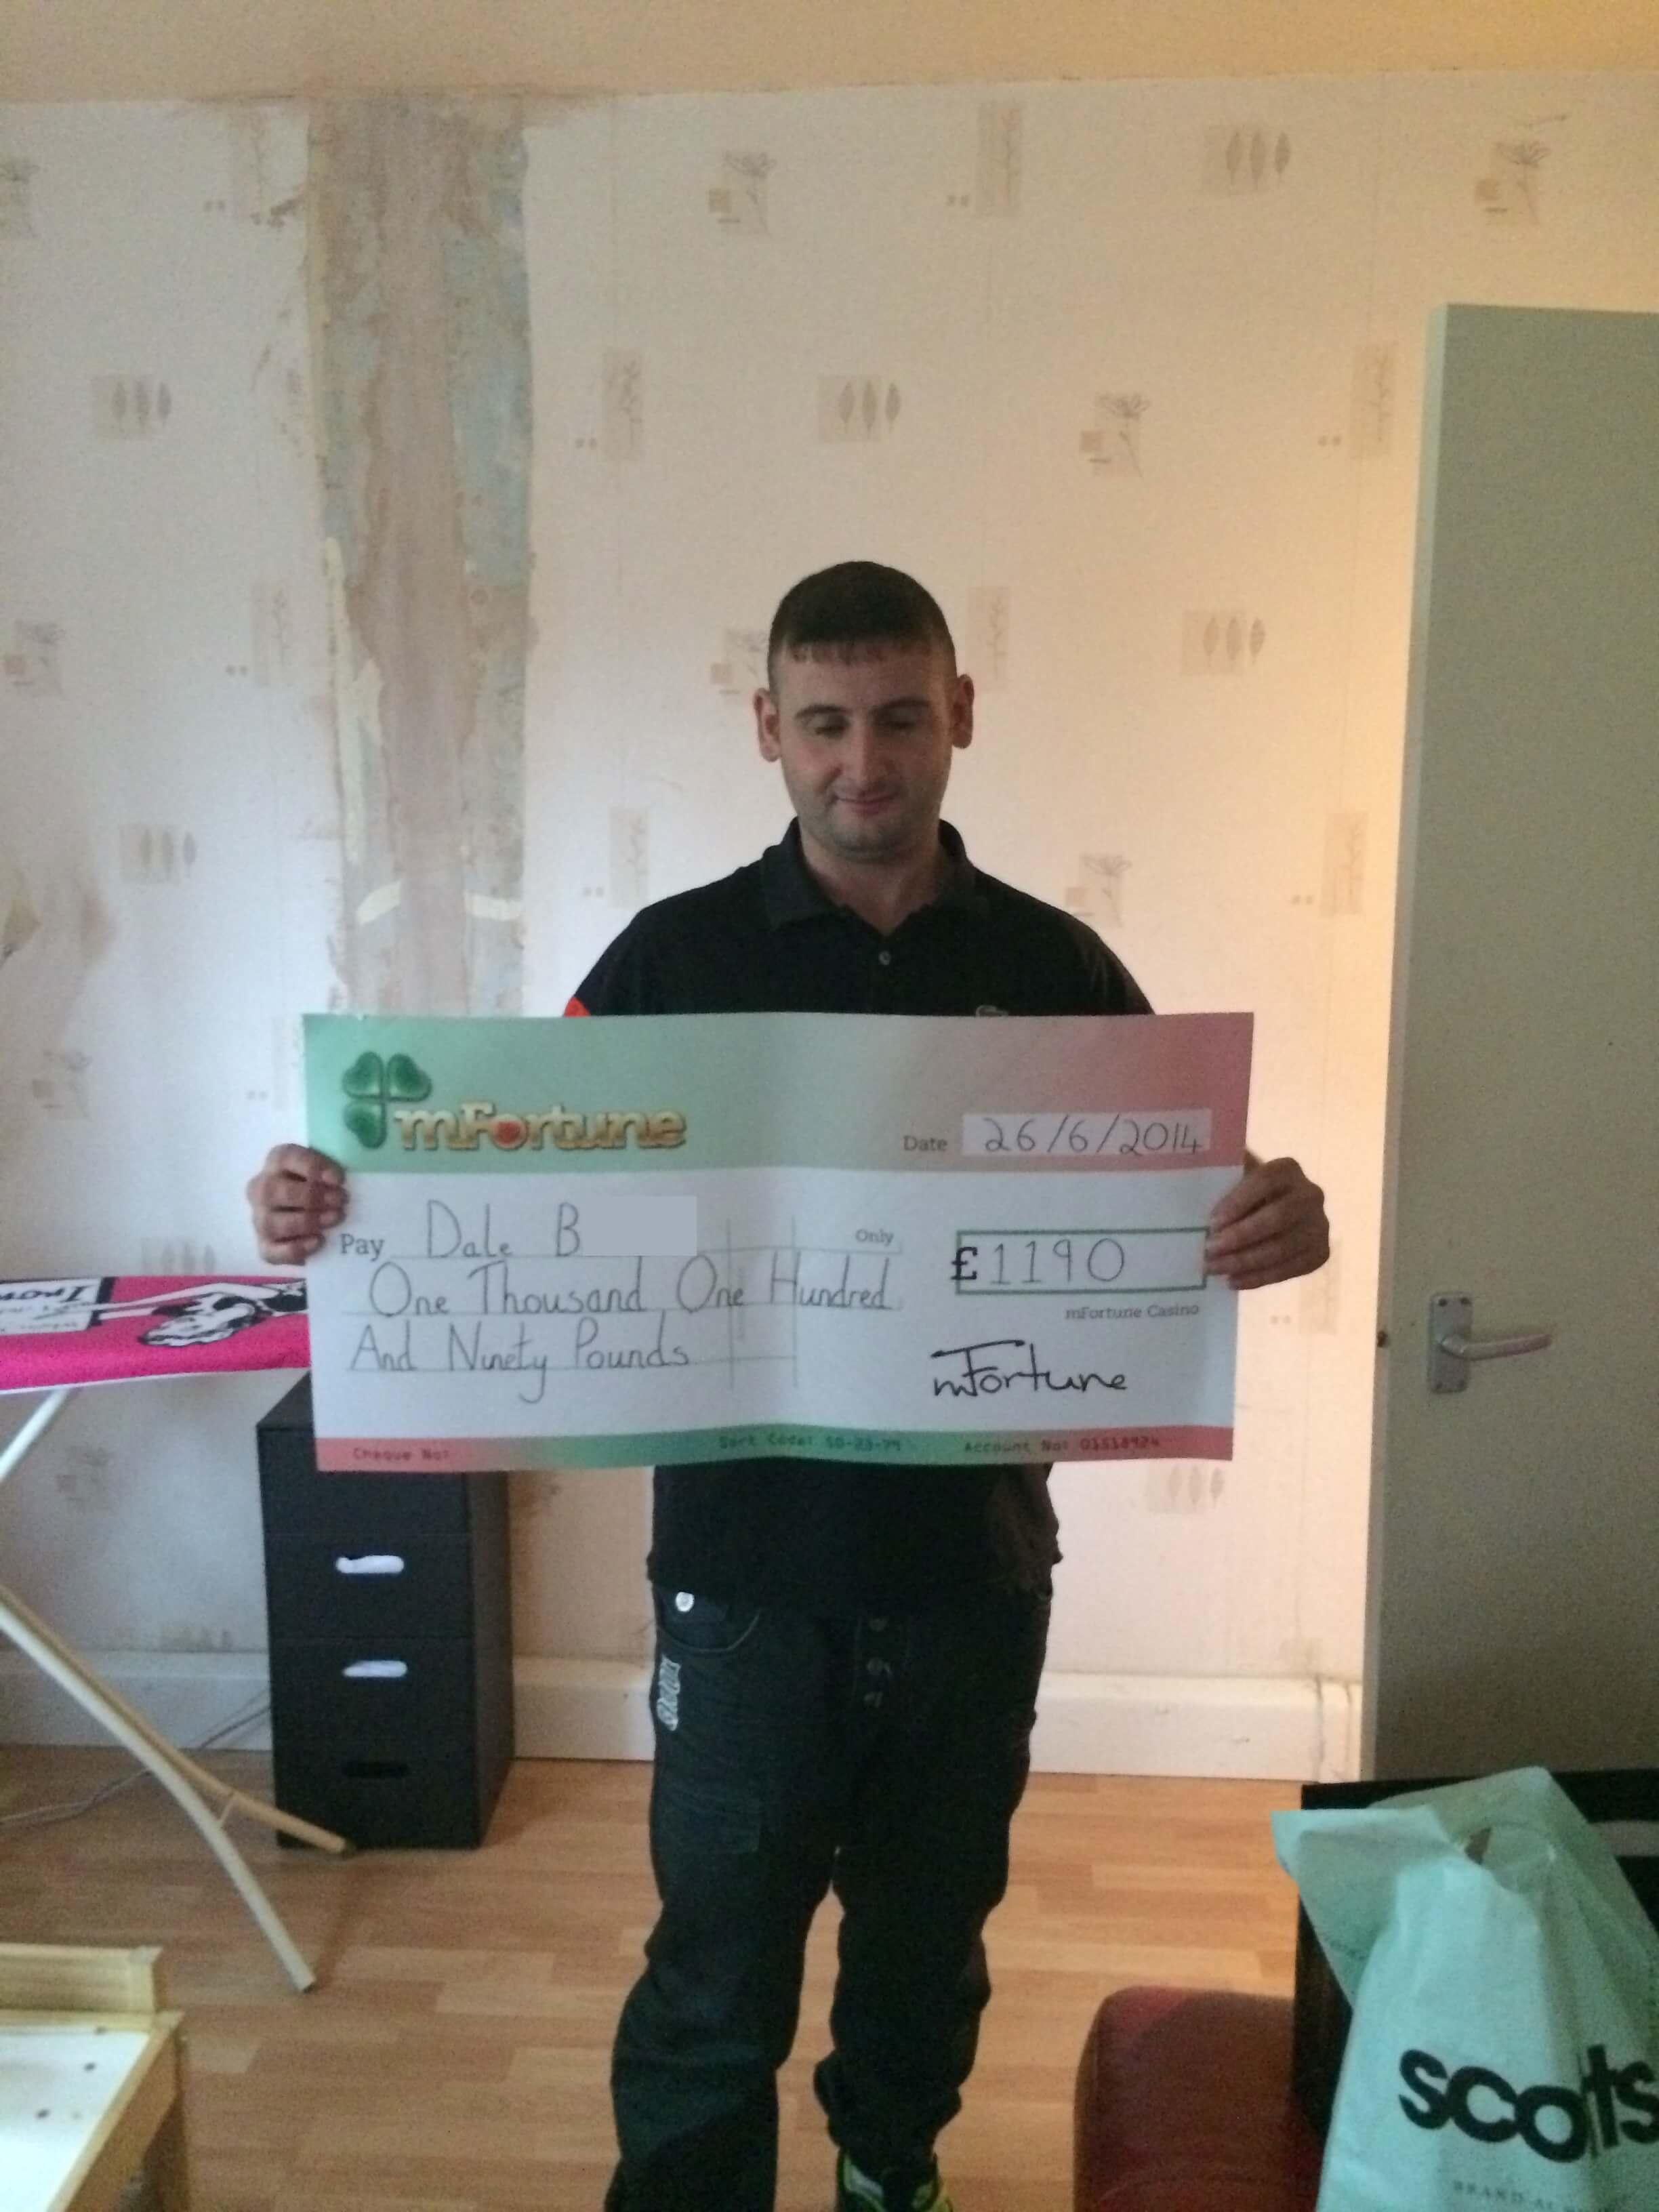 Dale B won £ 1,190